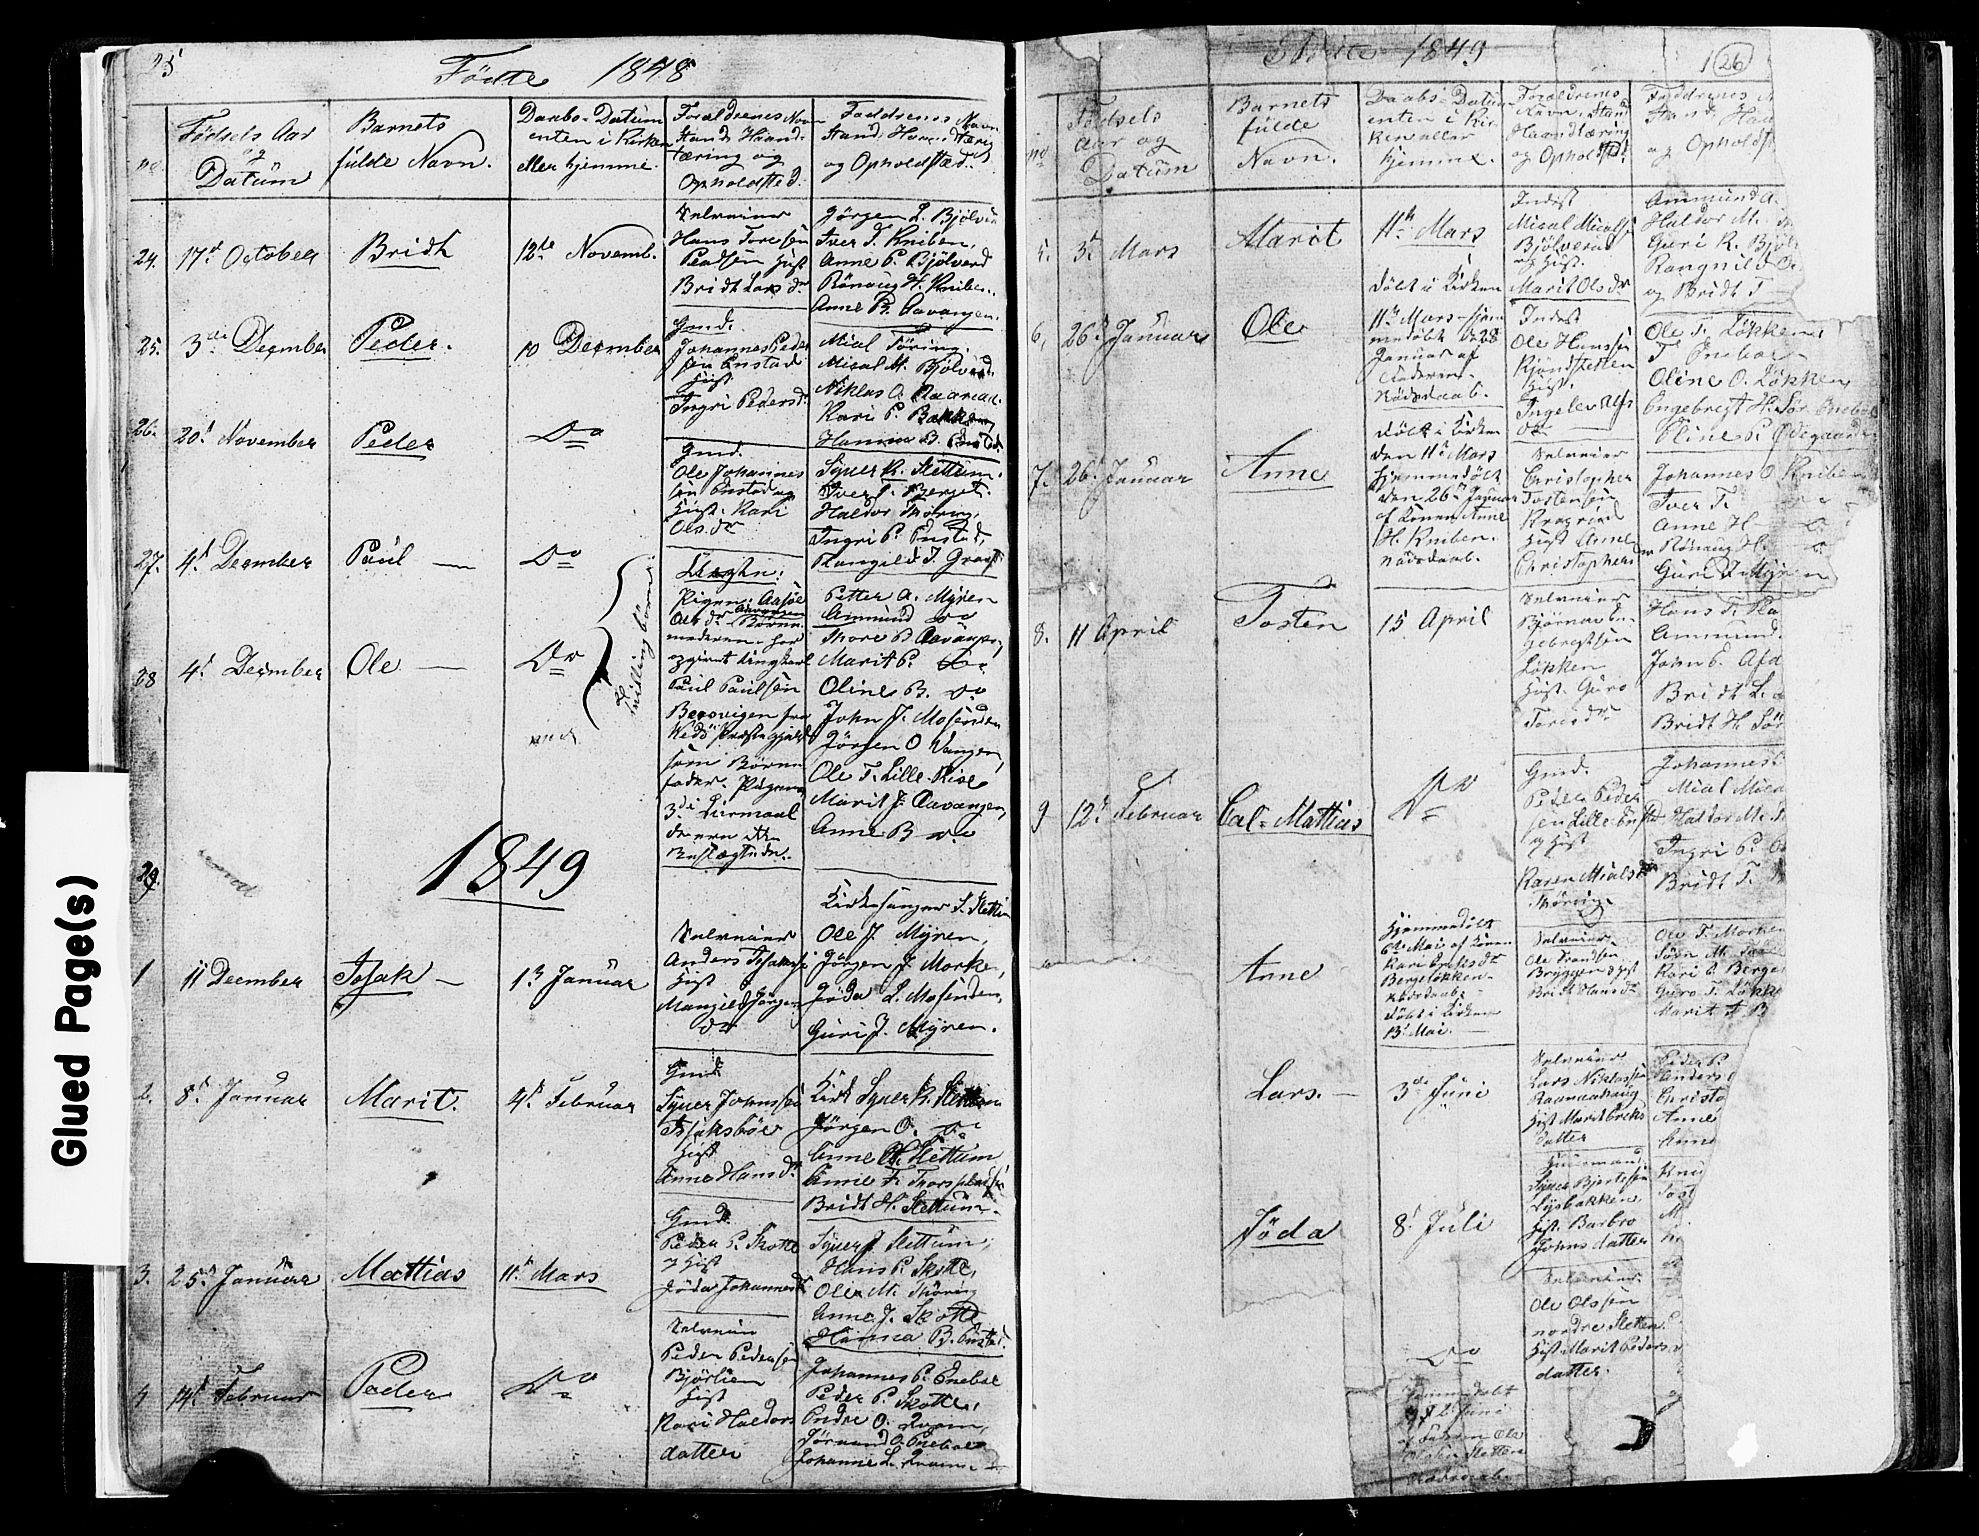 SAH, Lesja prestekontor, Klokkerbok nr. 4, 1842-1871, s. 25-26